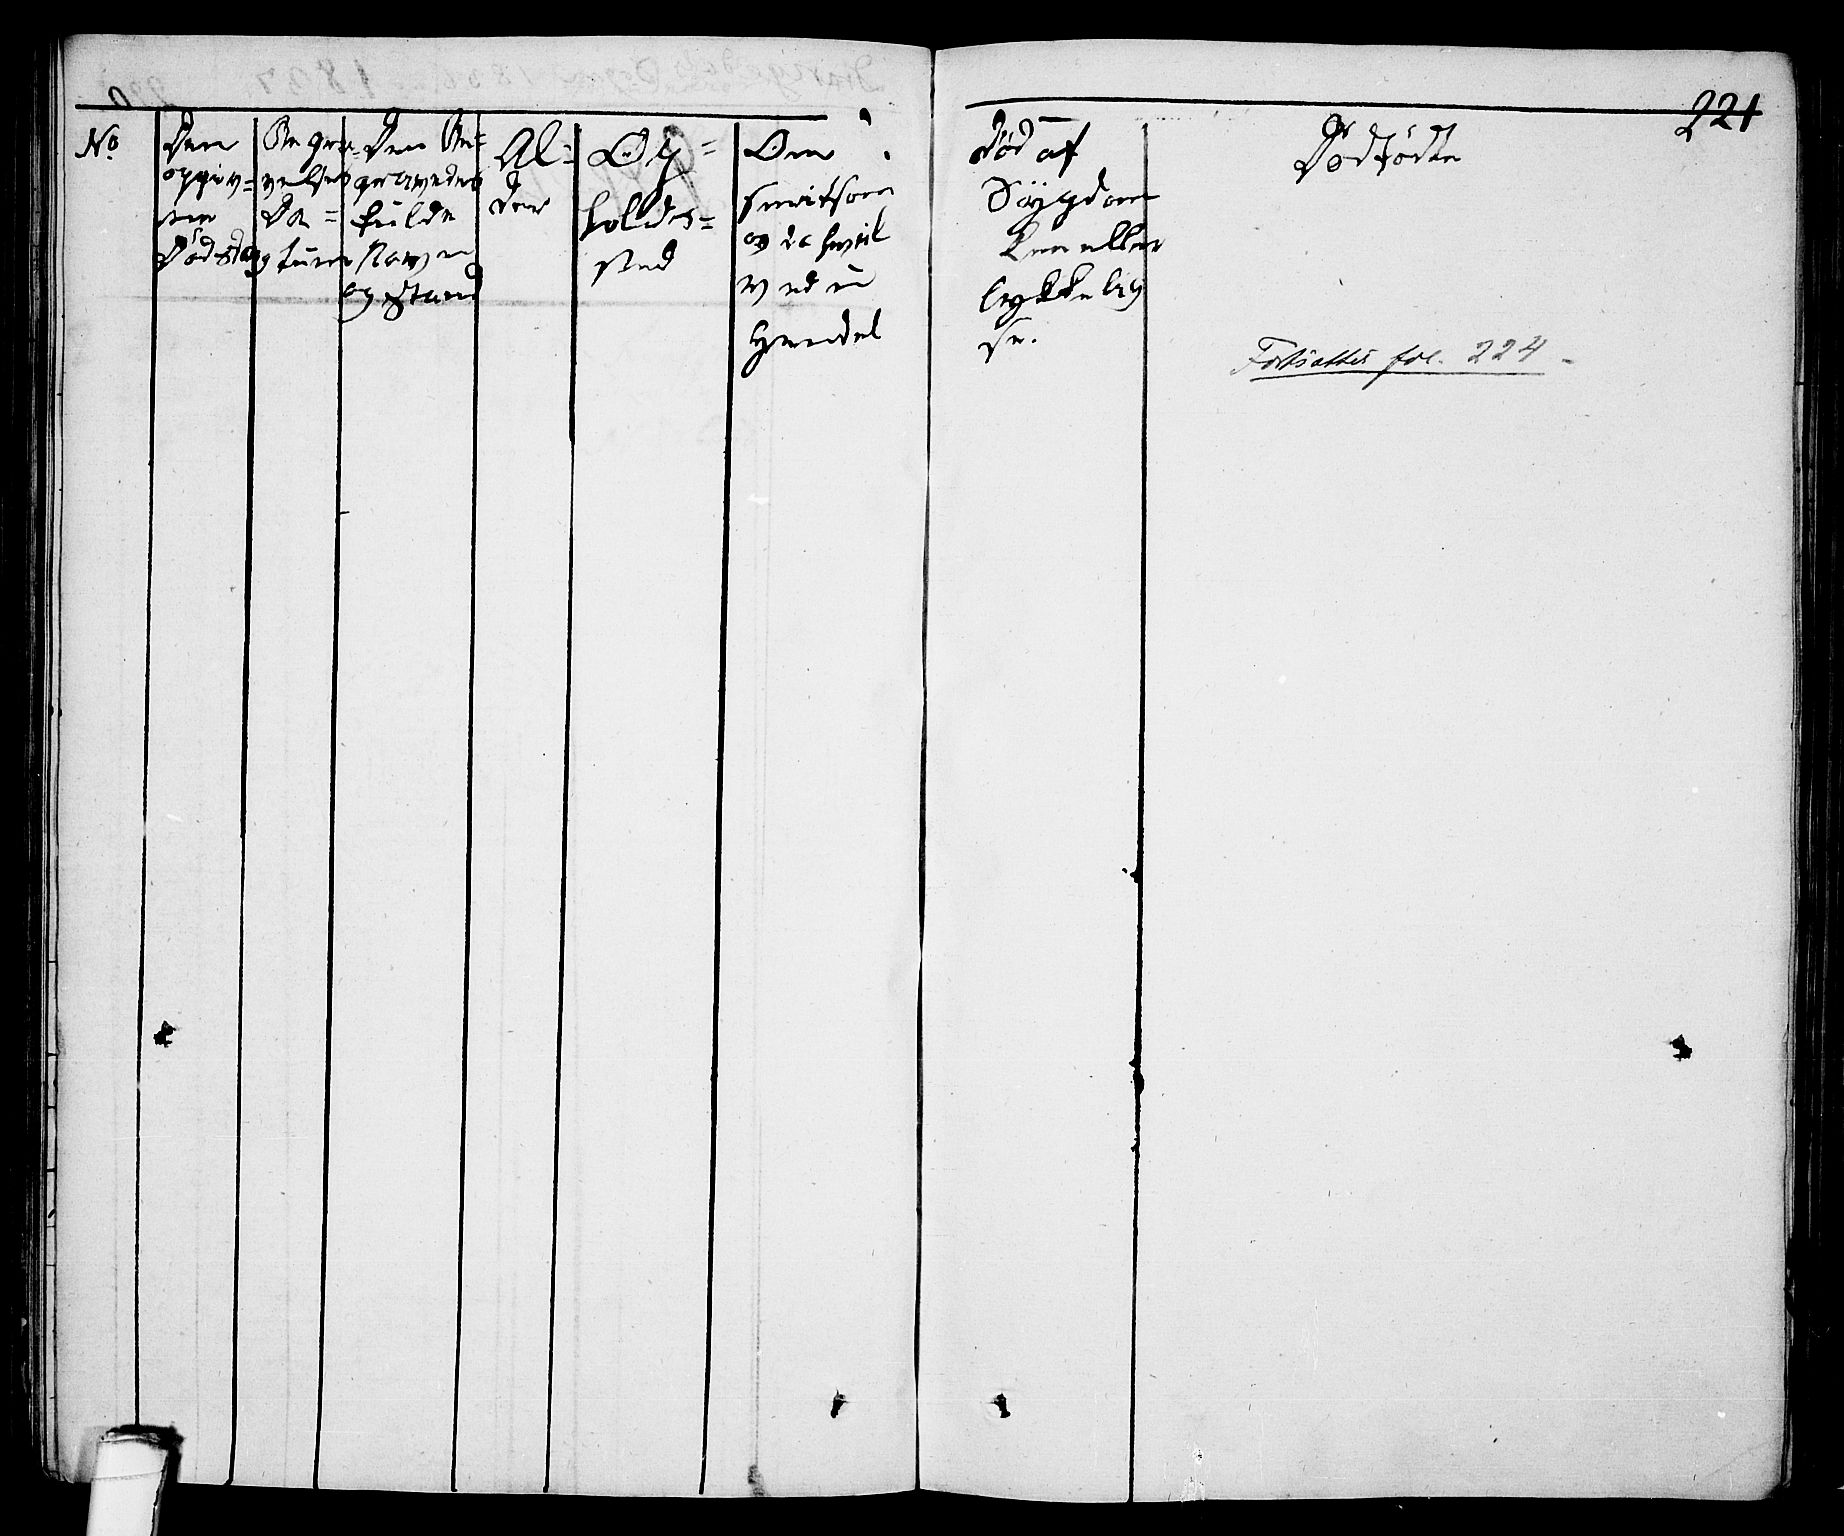 SAKO, Drangedal kirkebøker, F/Fa/L0006: Ministerialbok nr. 6, 1831-1837, s. 221